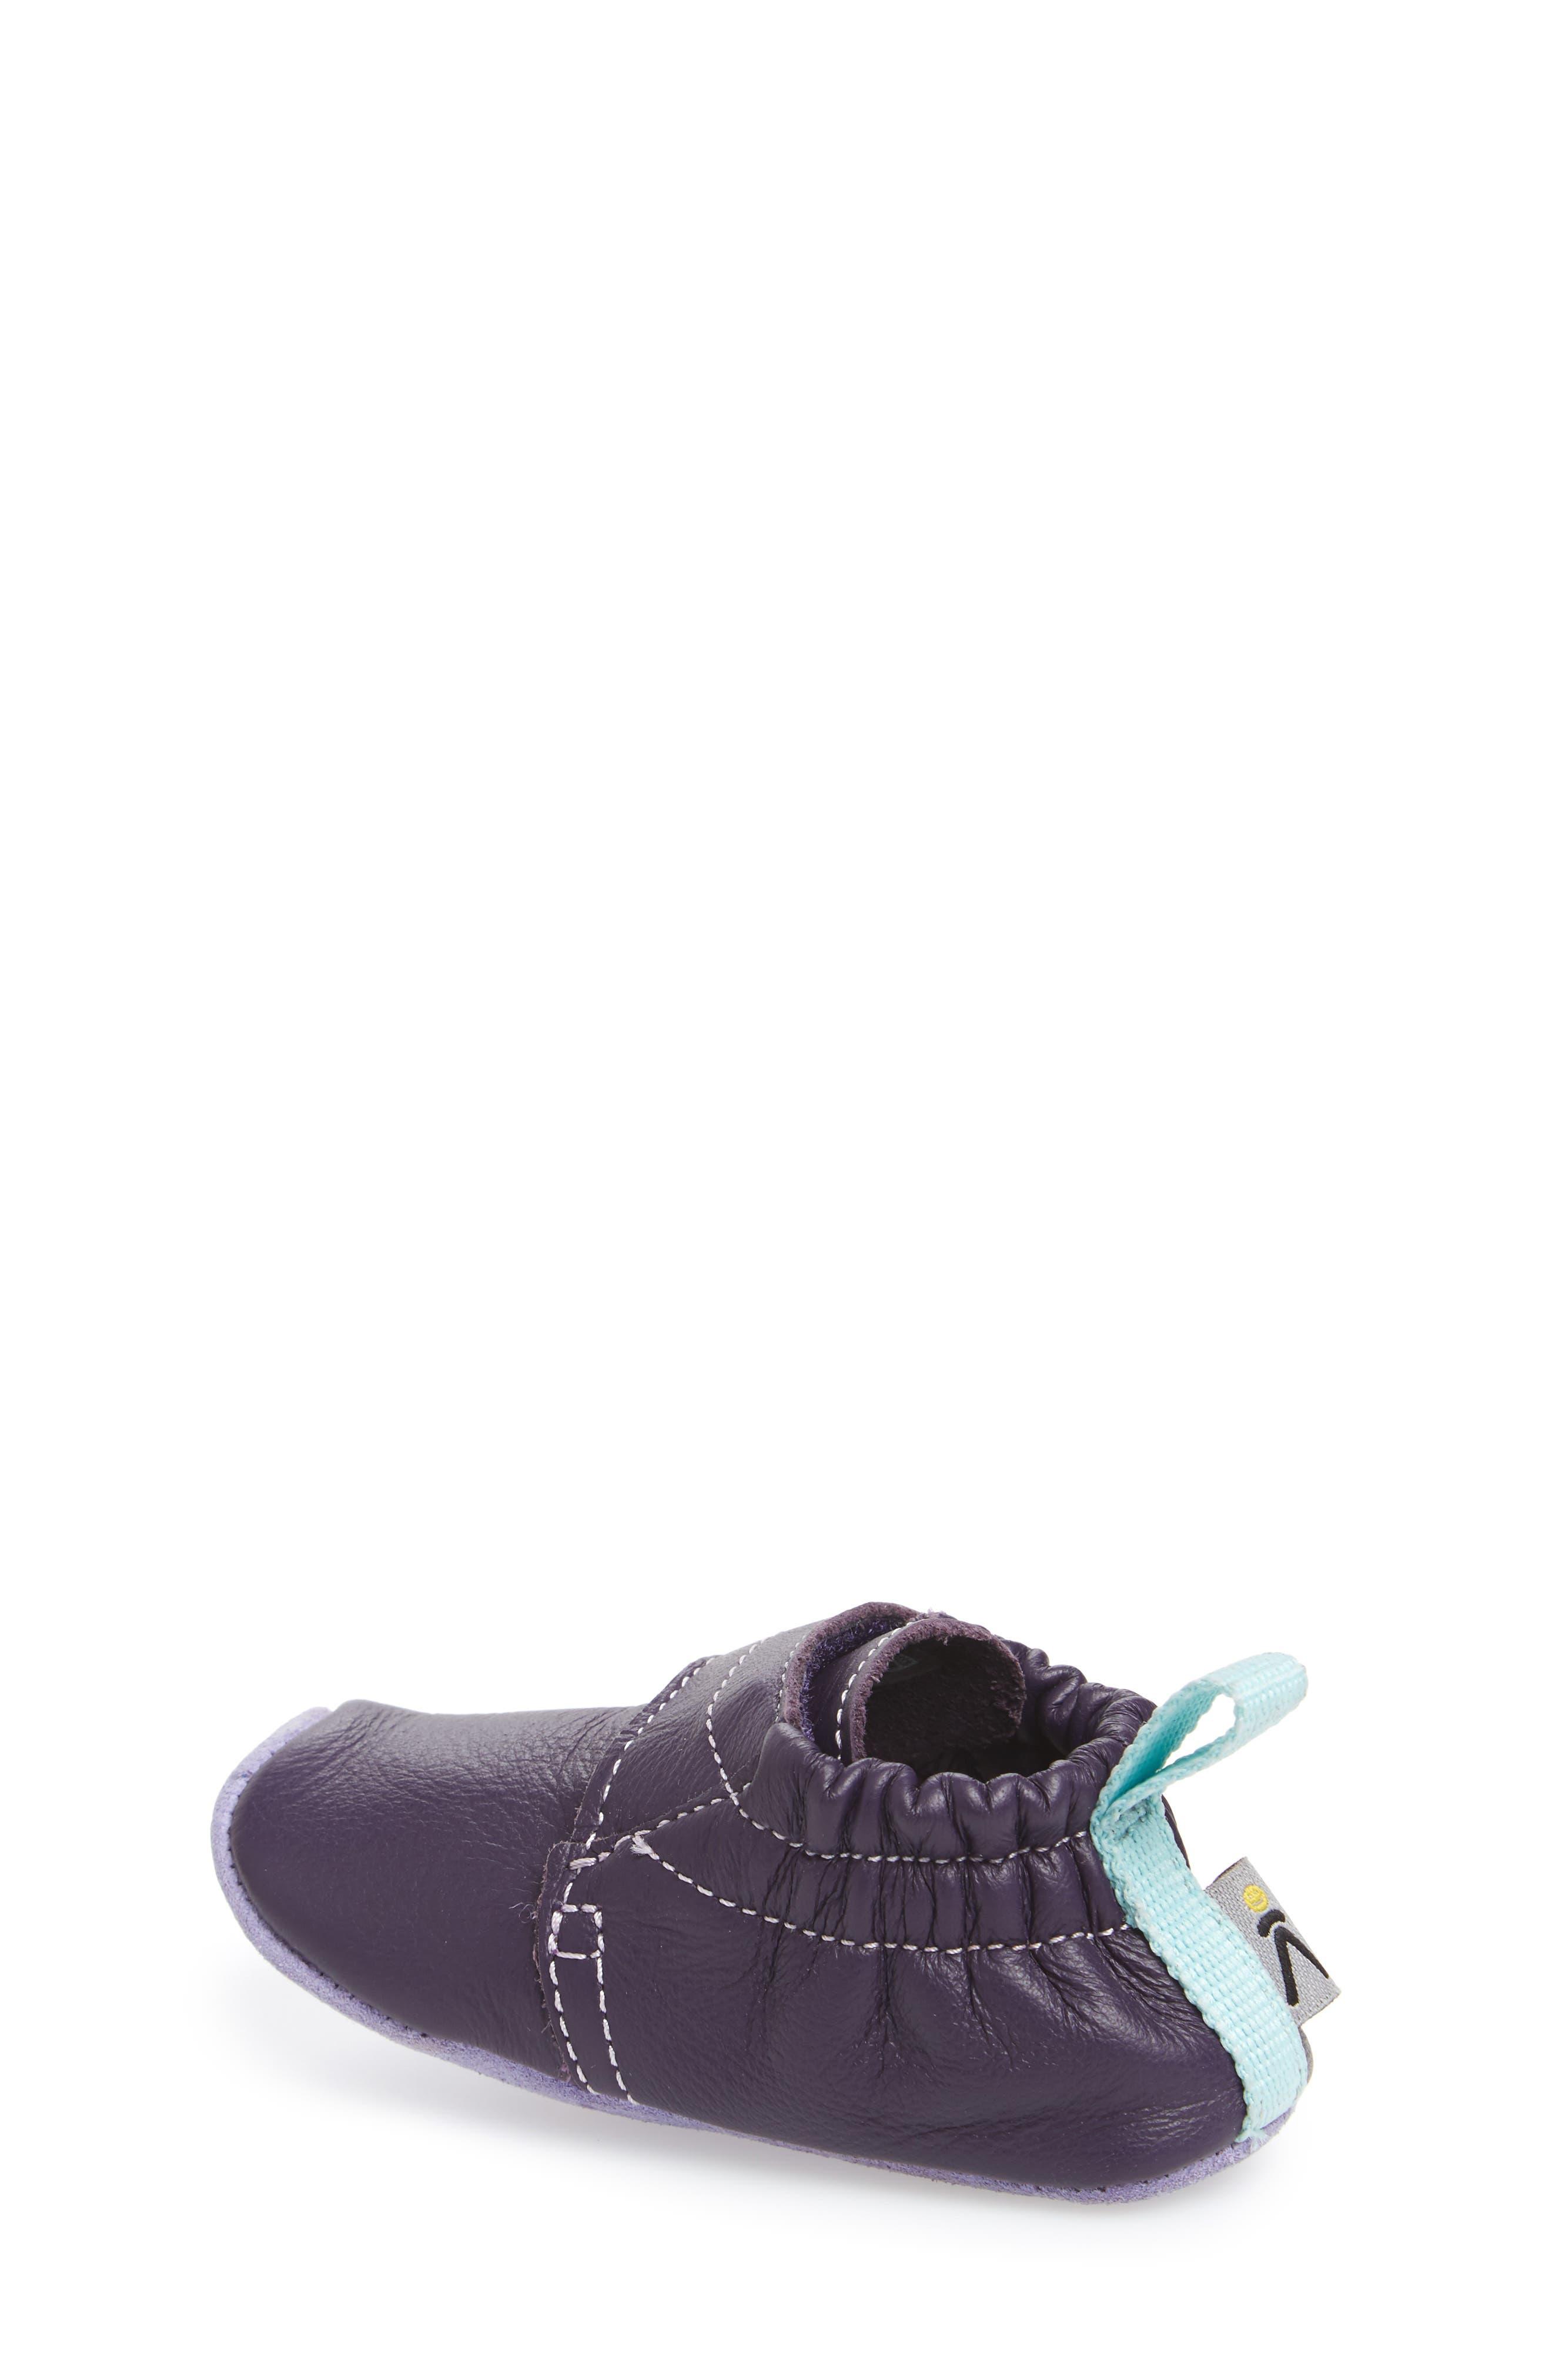 Leo Crib Shoe,                             Alternate thumbnail 2, color,                             PURPLE / SWEET LAVENDER